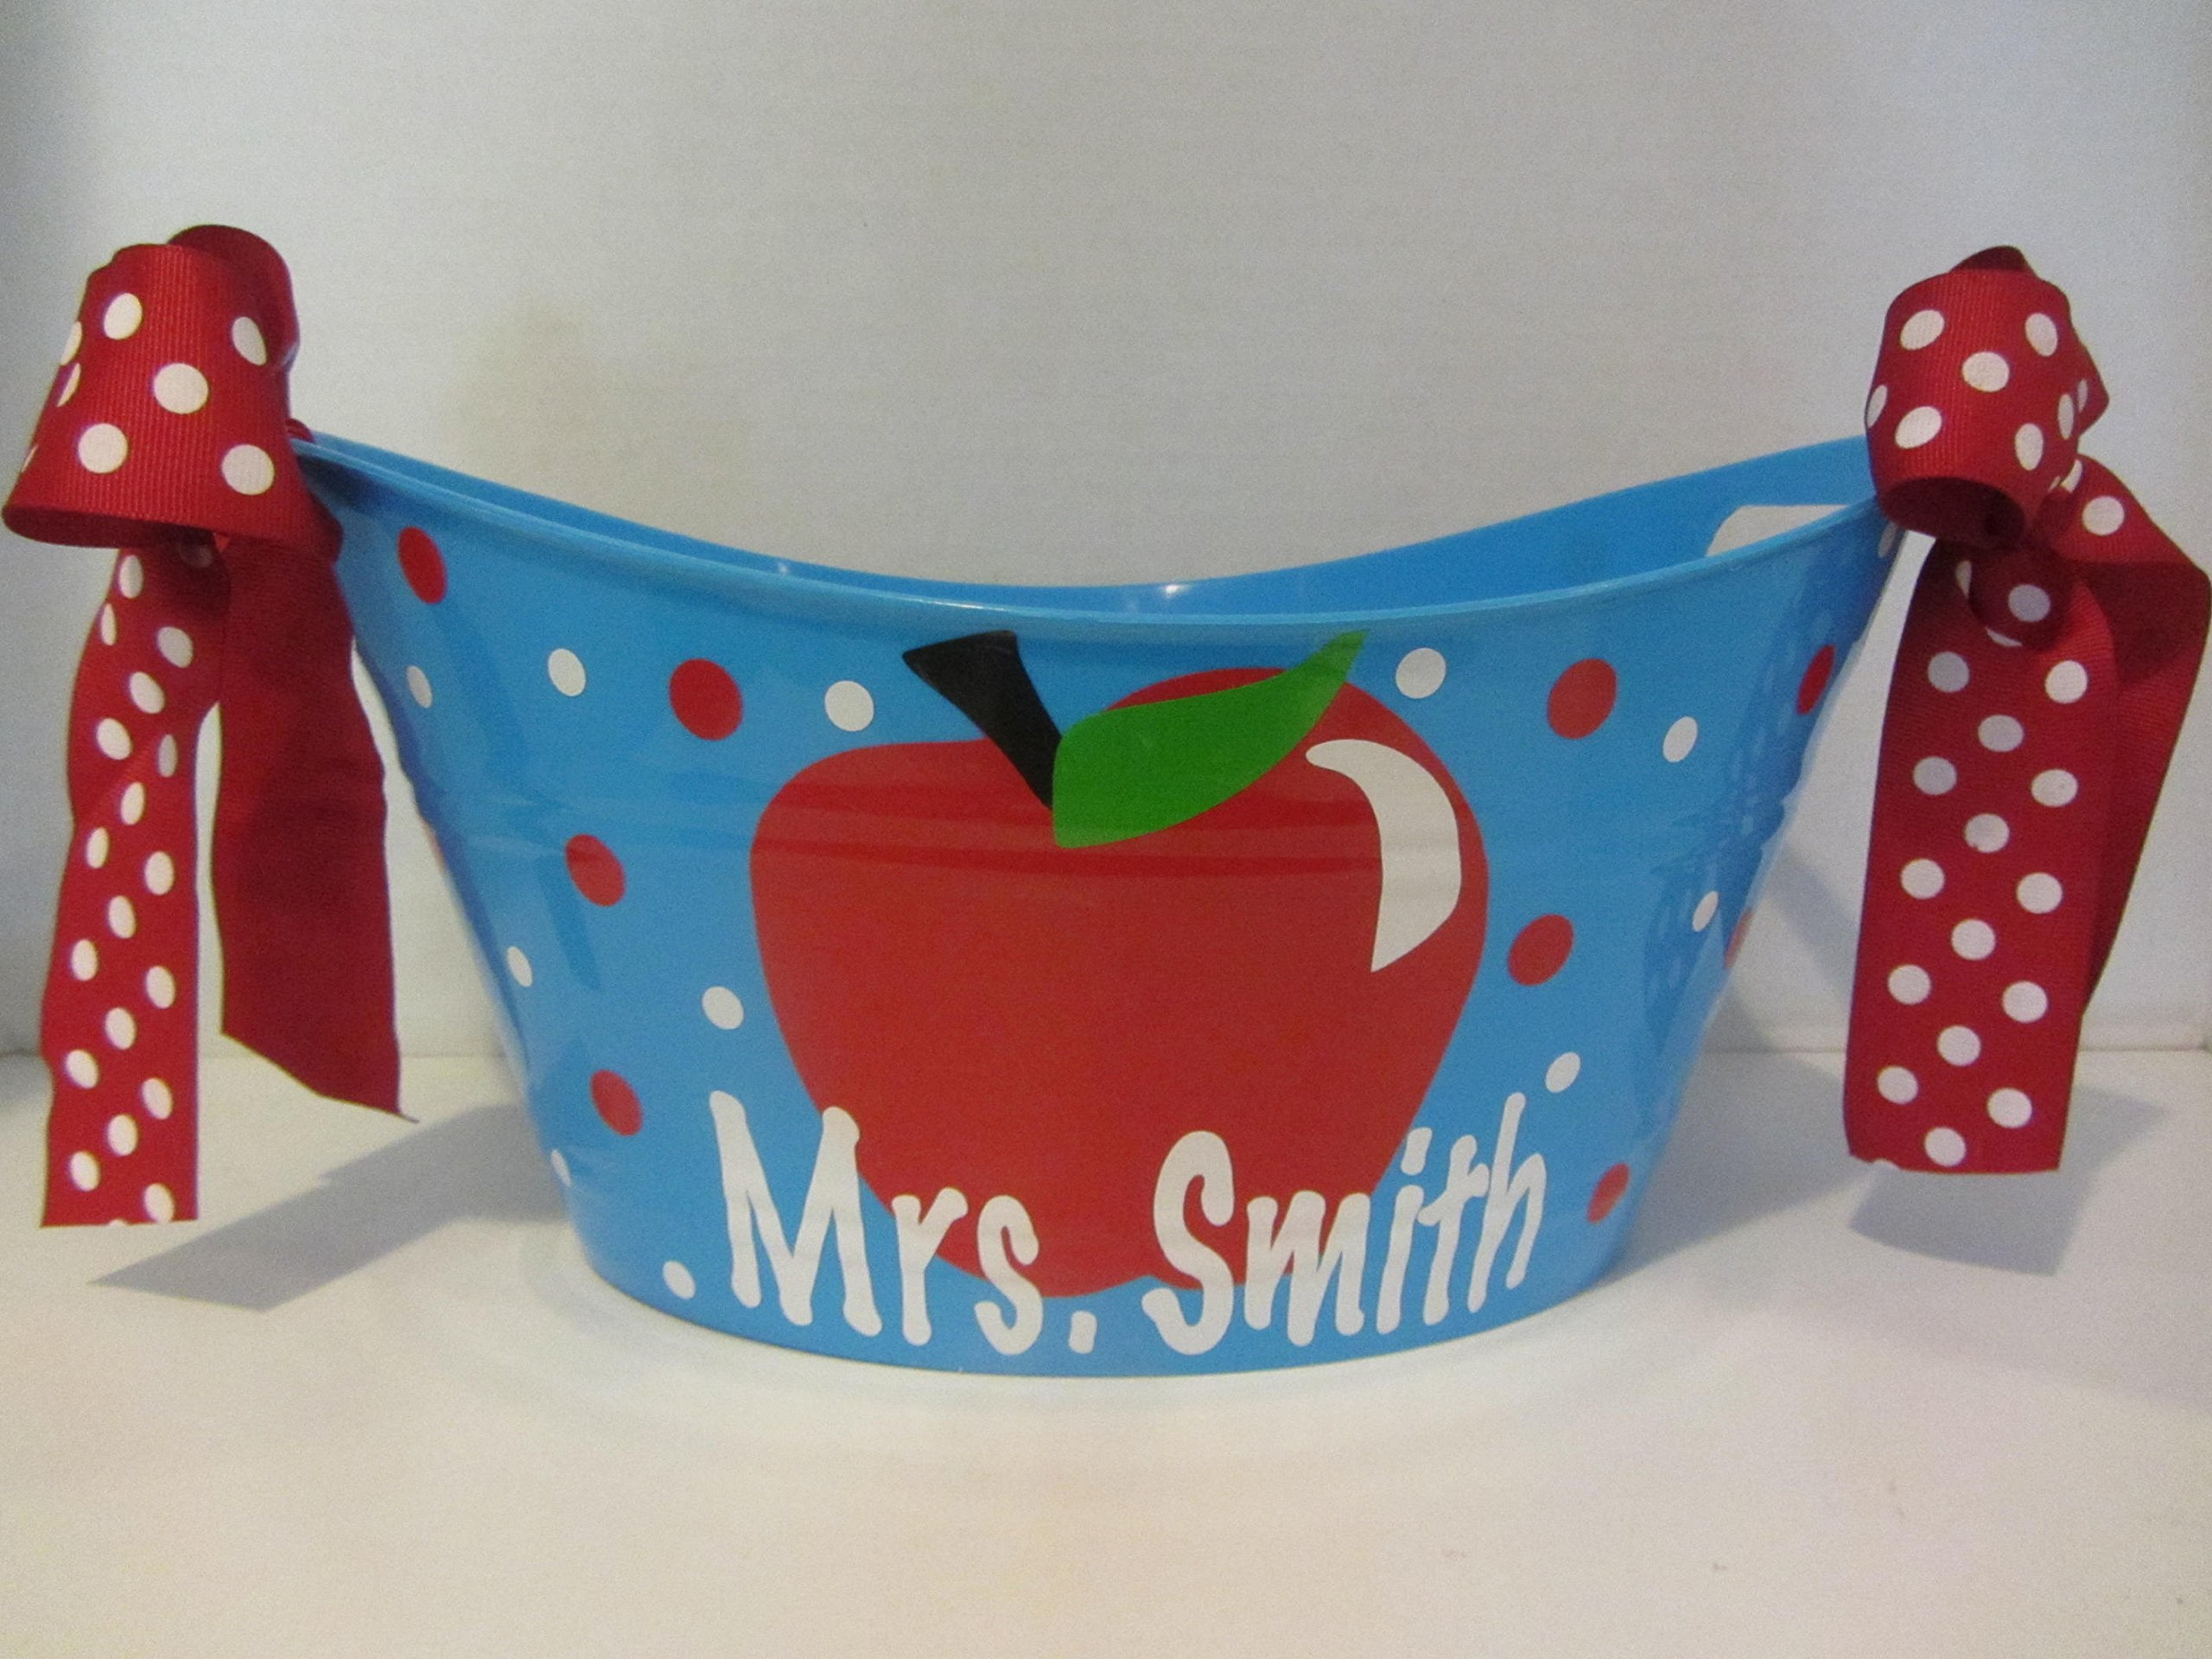 Teacher gift tub - personalized - apple design